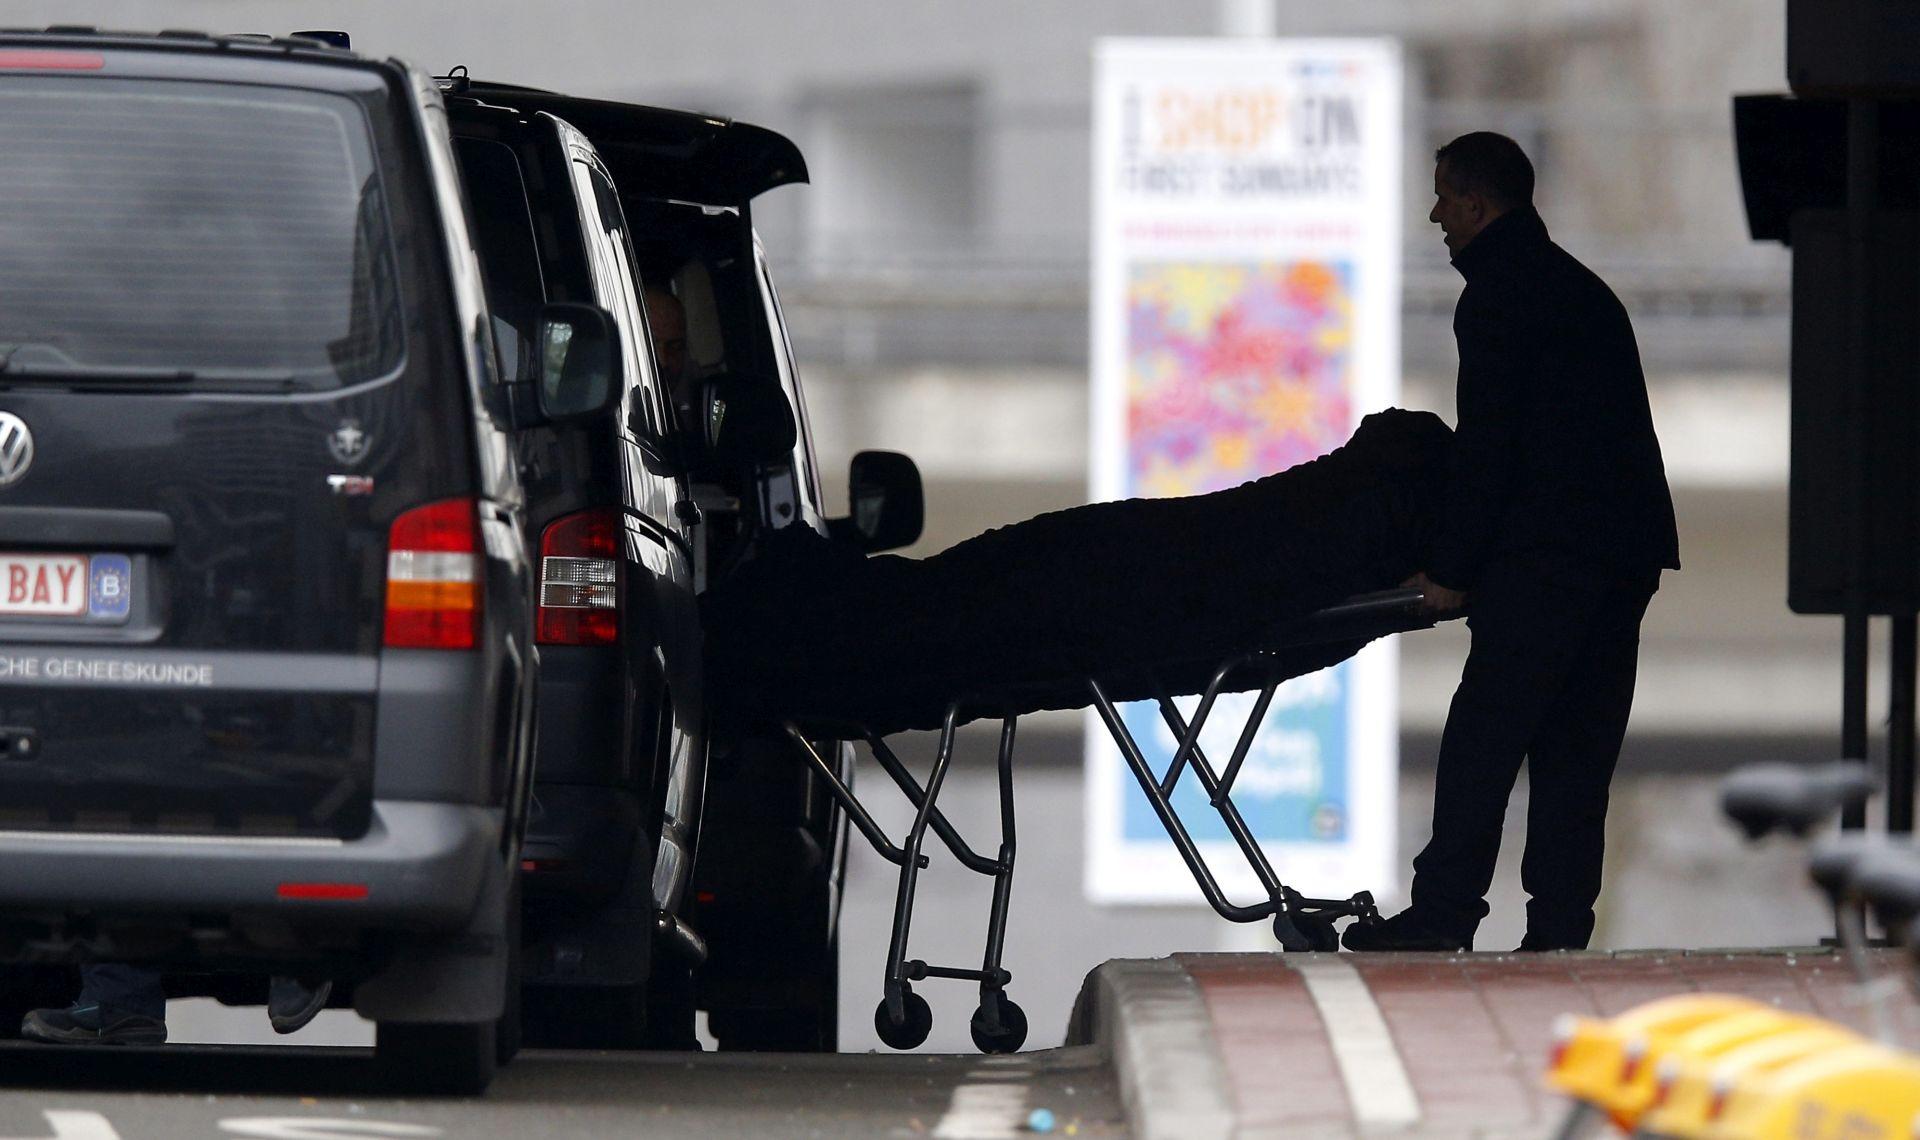 Napadi u Bruxellesu: Stižu kritike, Belgija ih drži neutemeljenima